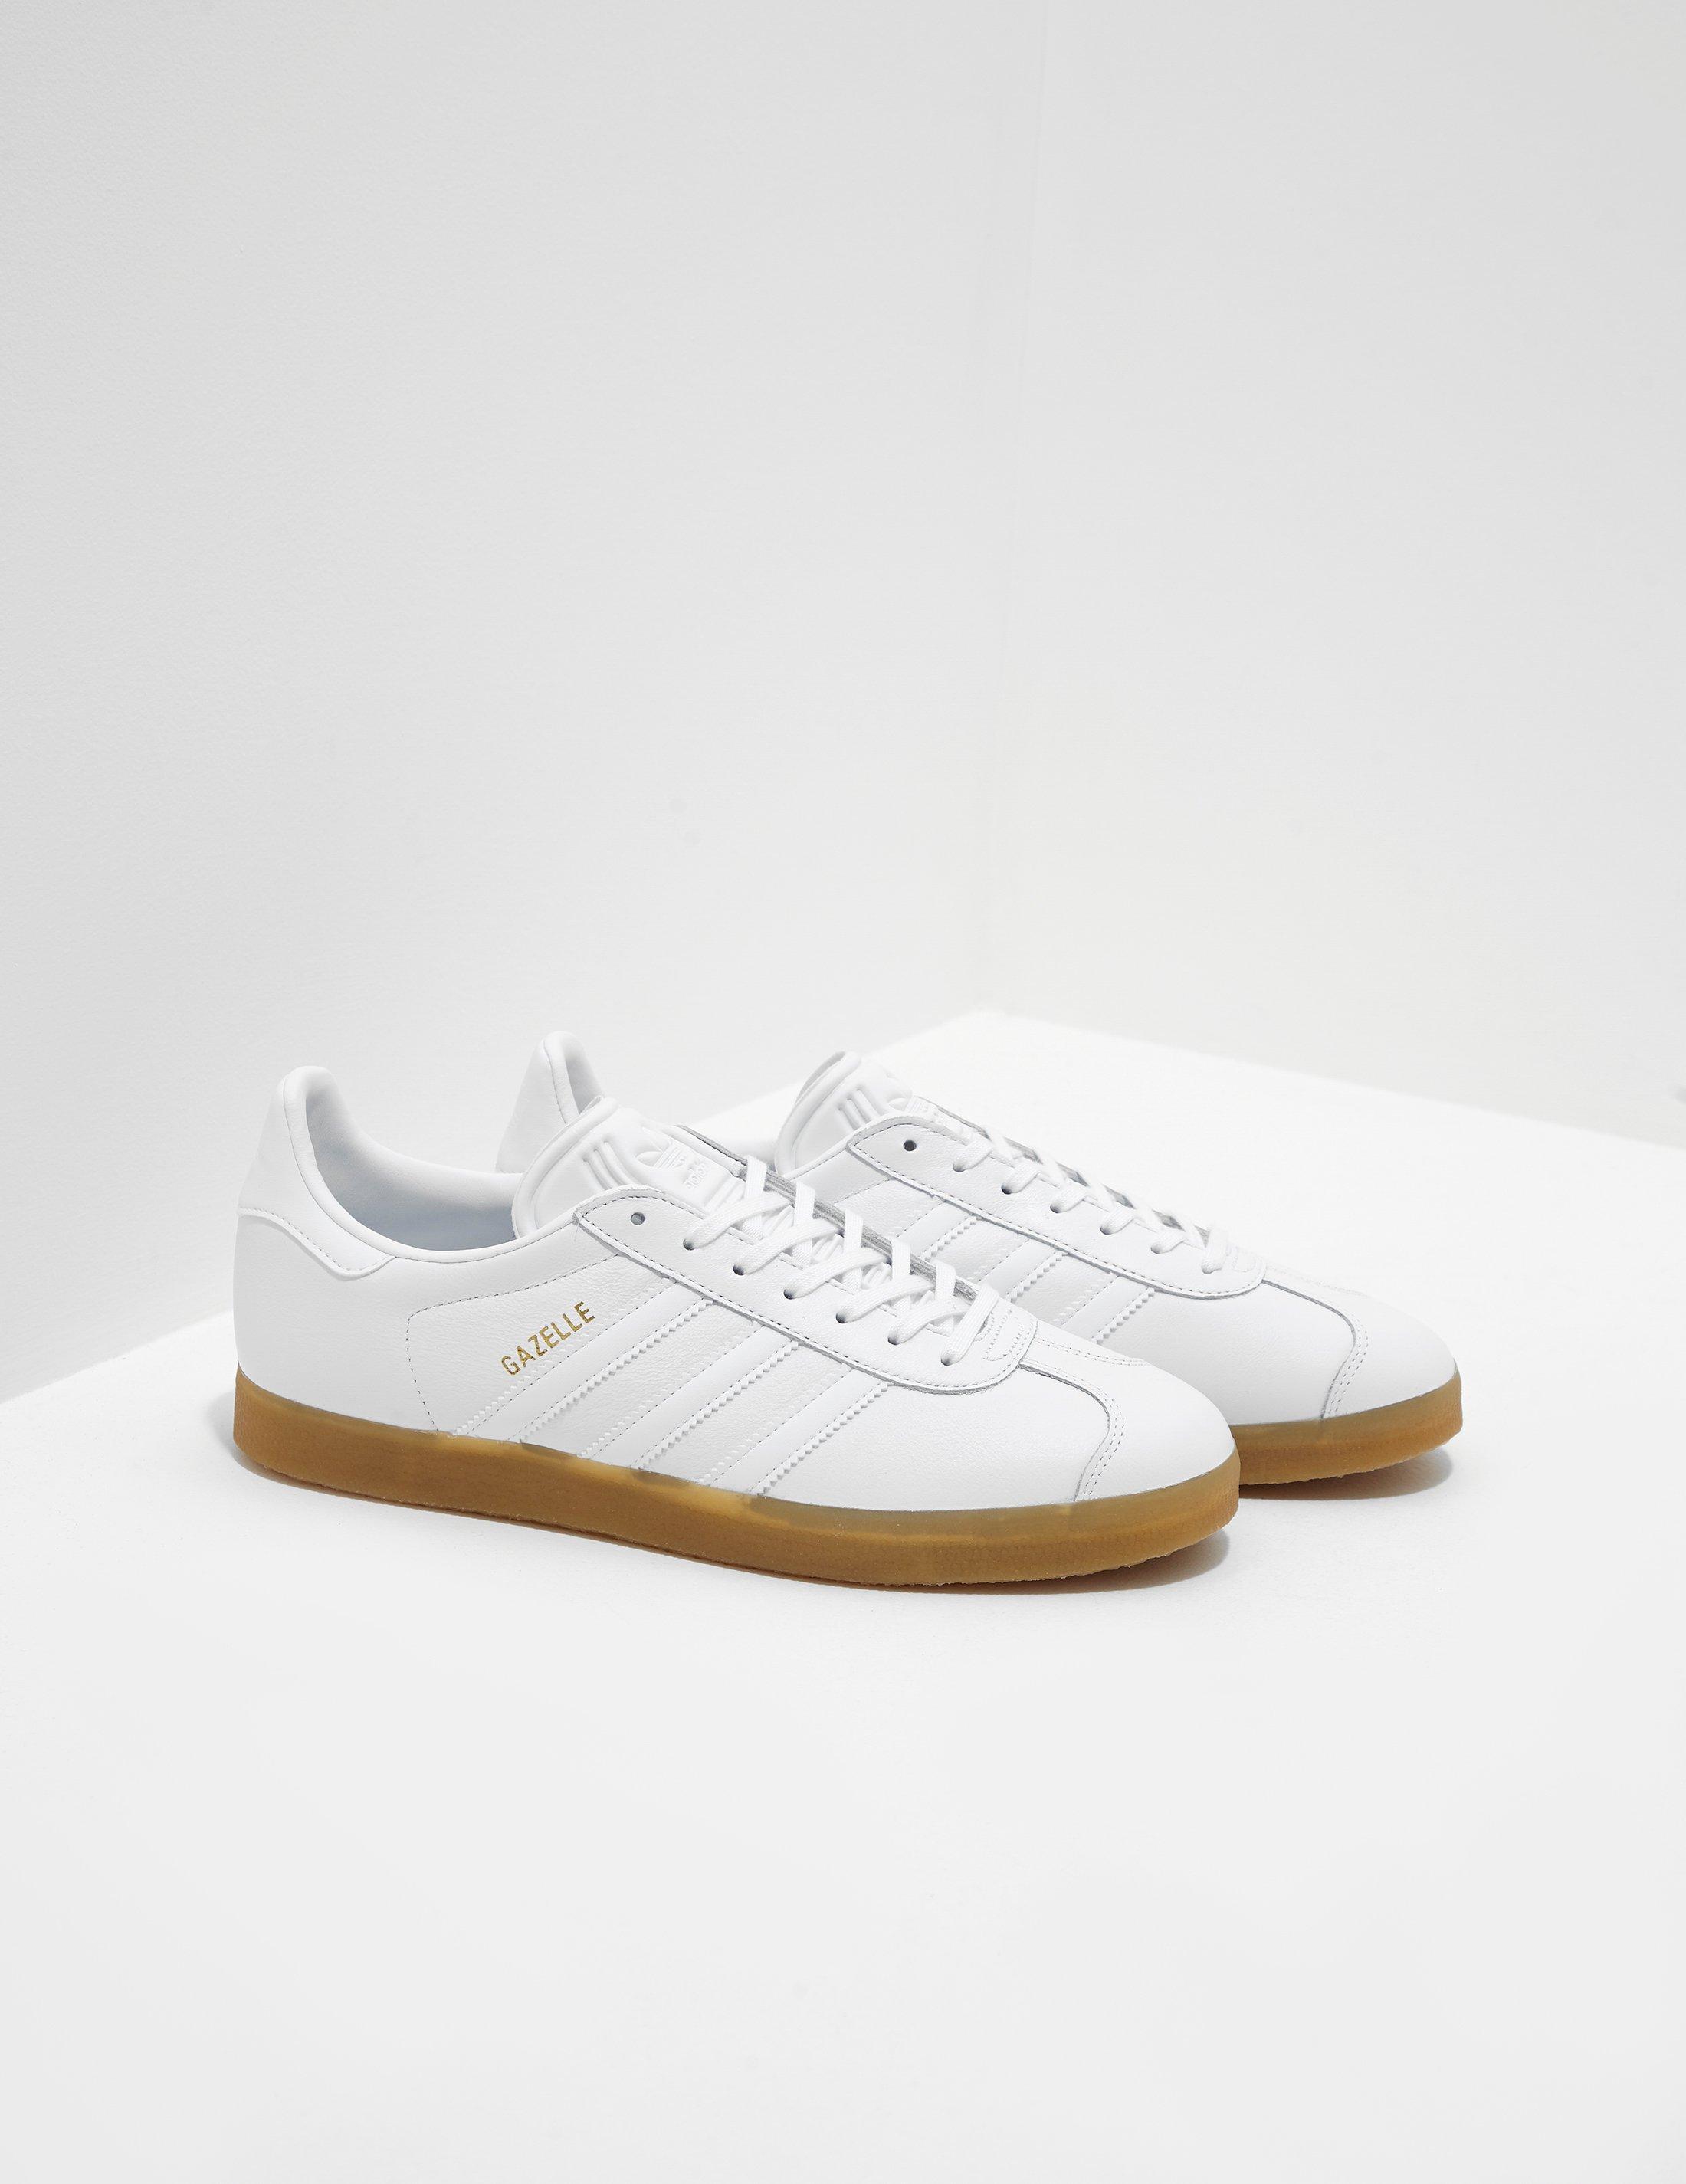 Lyst - adidas Originals Mens Gazelle White in White for Men df123477b